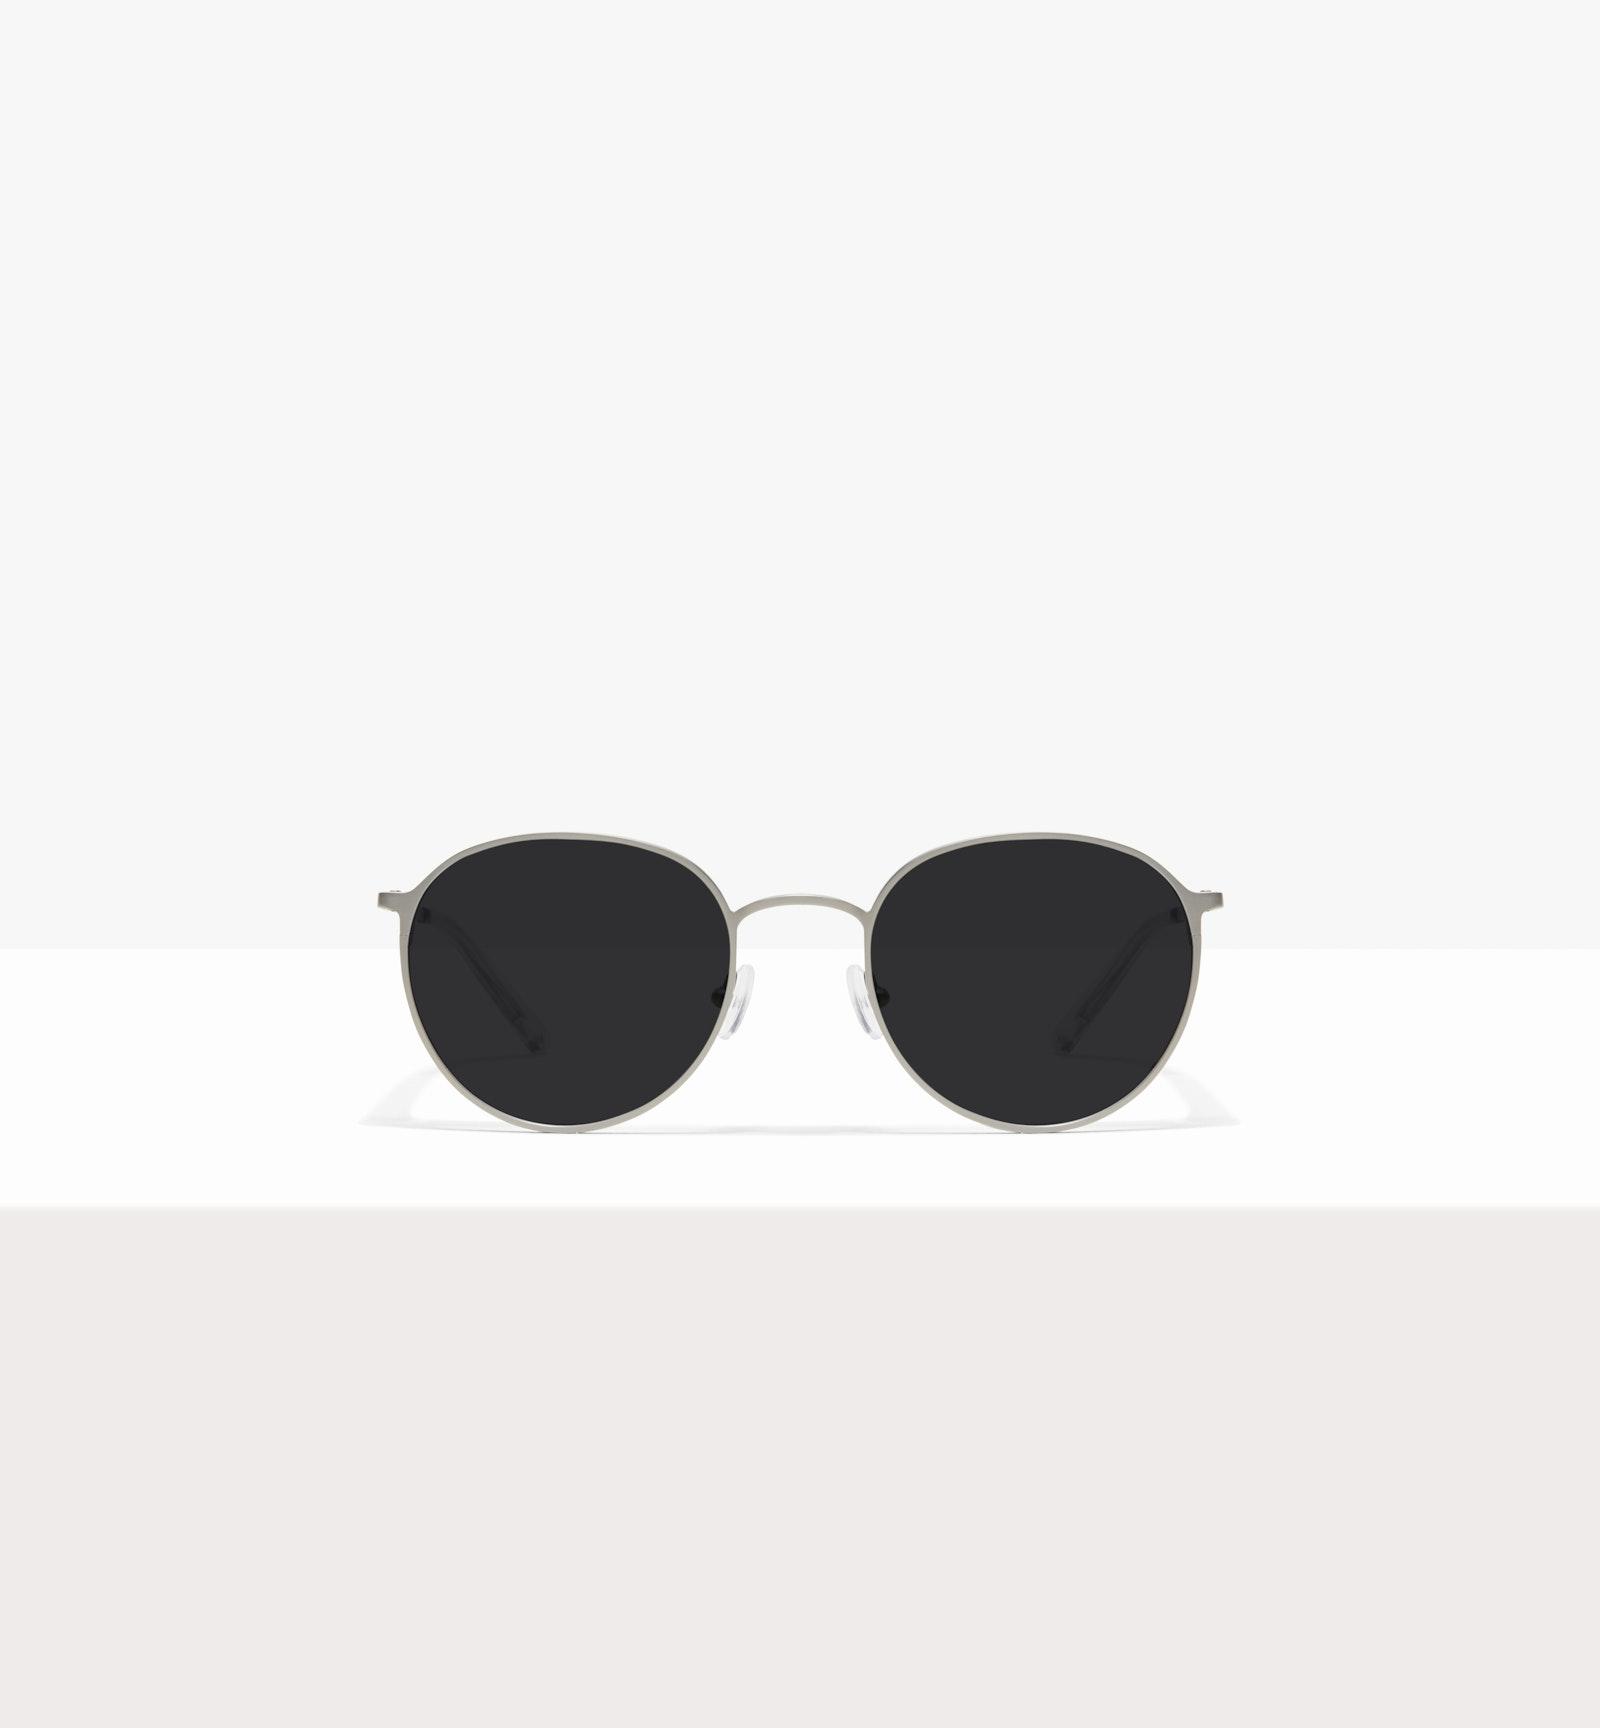 Affordable Fashion Glasses Round Sunglasses Men Ridge Silver